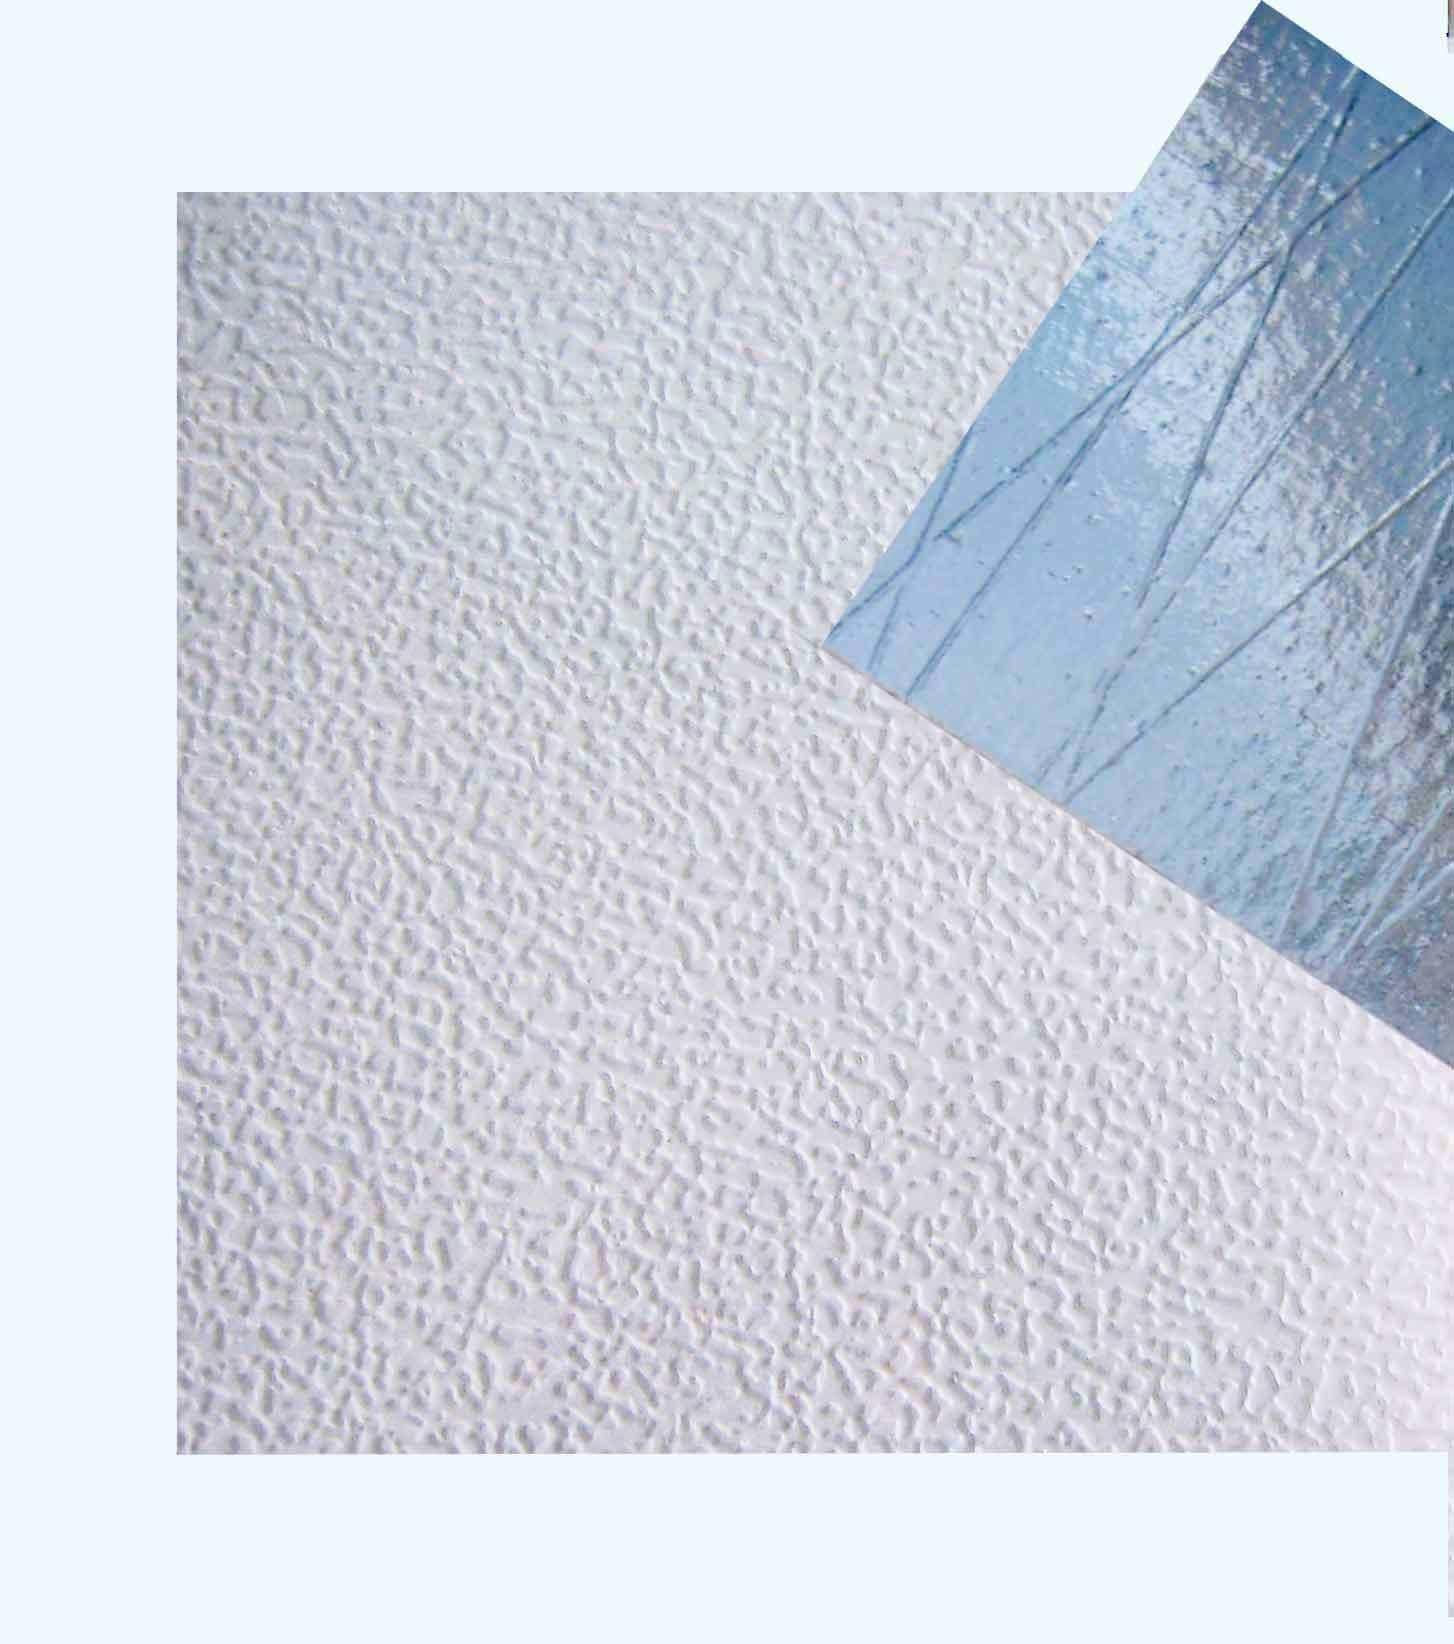 Us gypsum ceiling tiles choice image tile flooring design ideas us gypsum ceiling tiles gallery tile flooring design ideas us gypsum ceiling tiles gallery tile flooring dailygadgetfo Images